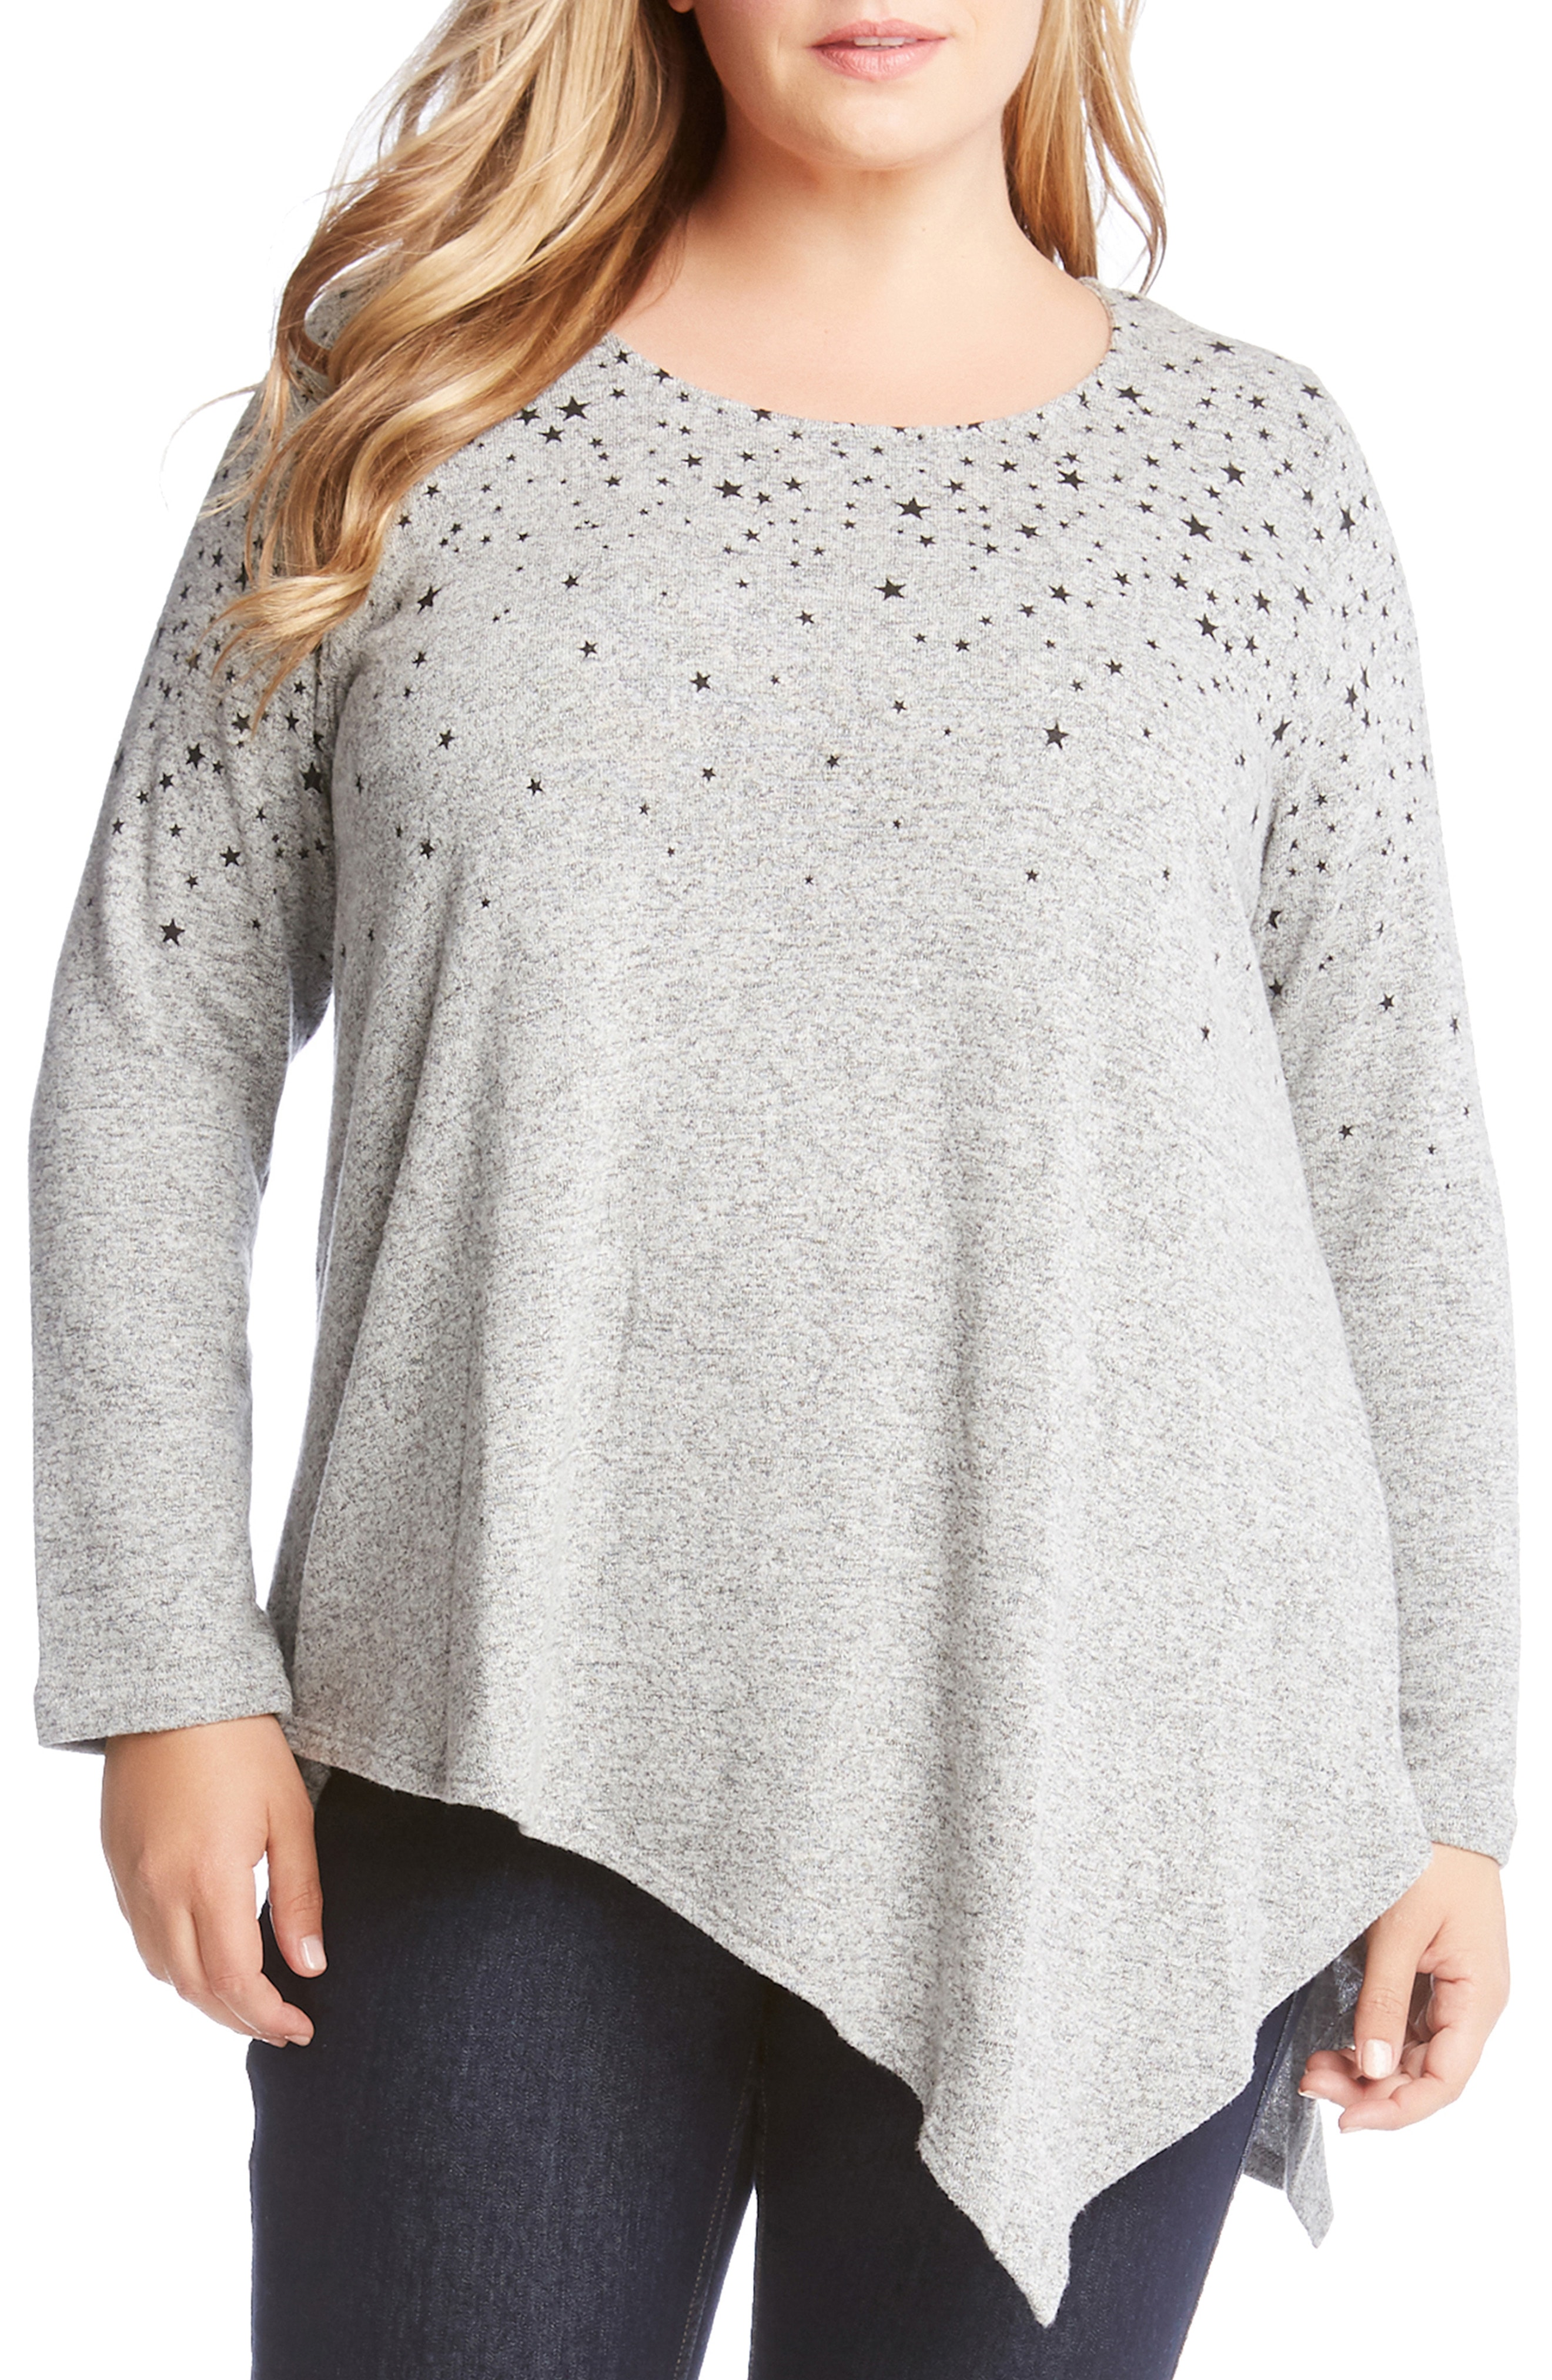 Karen Kane Asymmetrical Star Print Sweater (Plus Size)